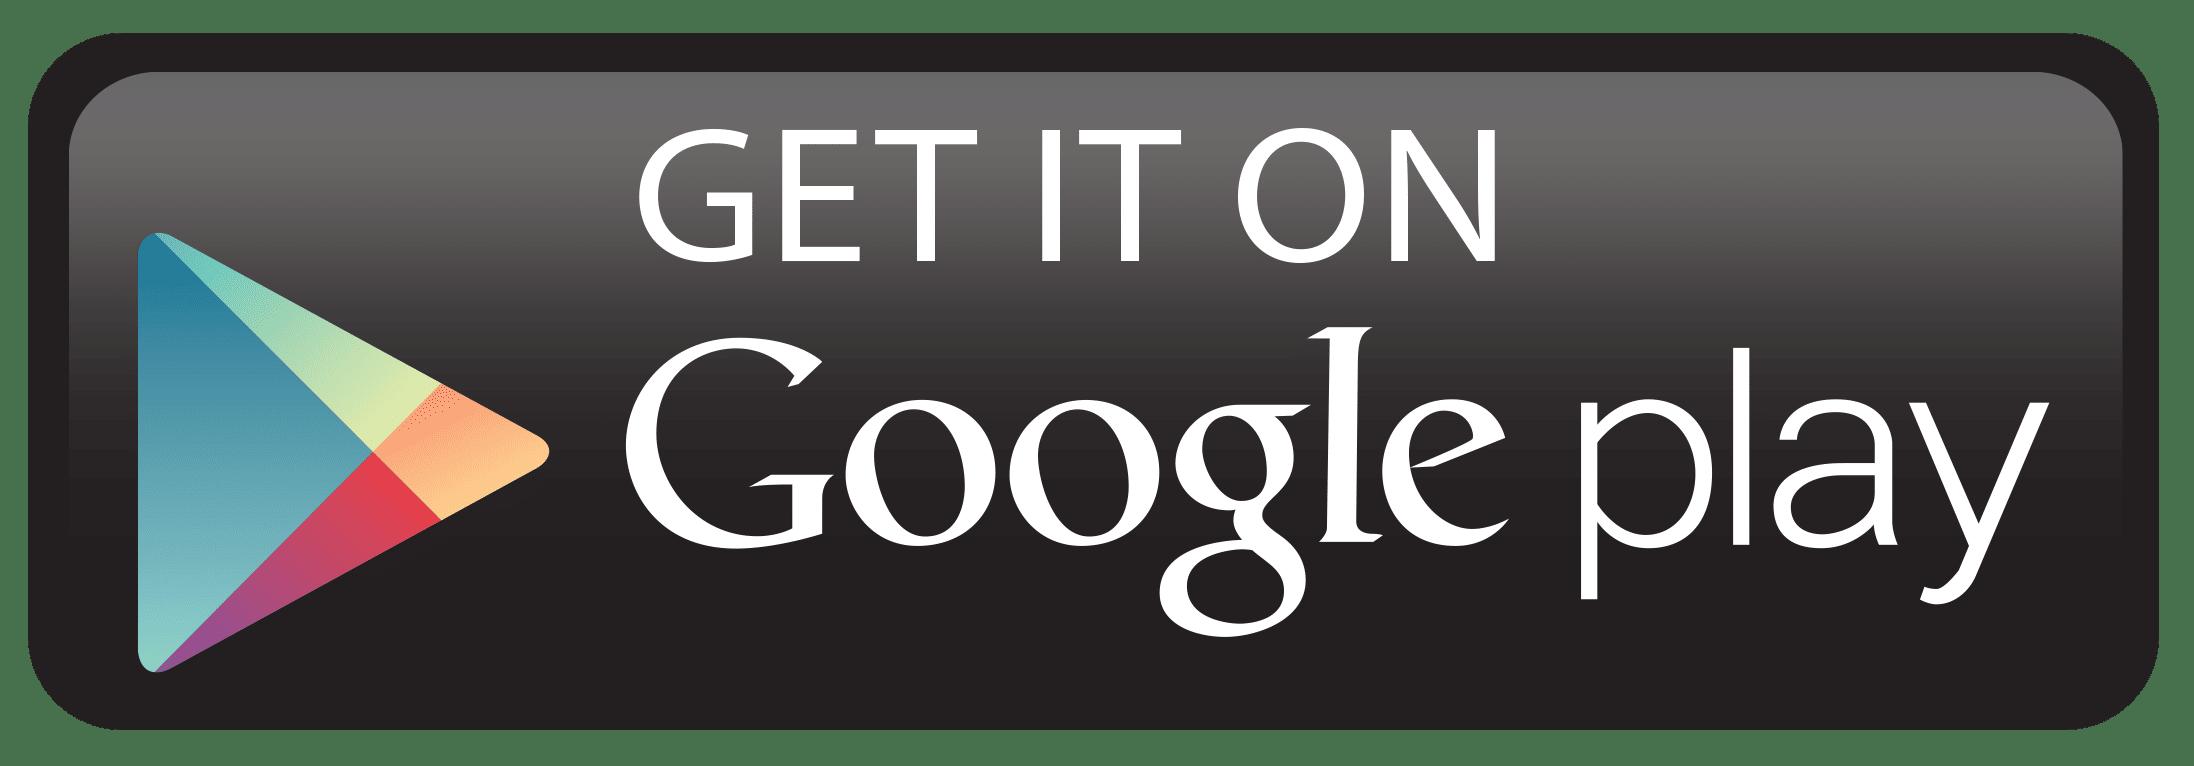 QR Code Android Bild